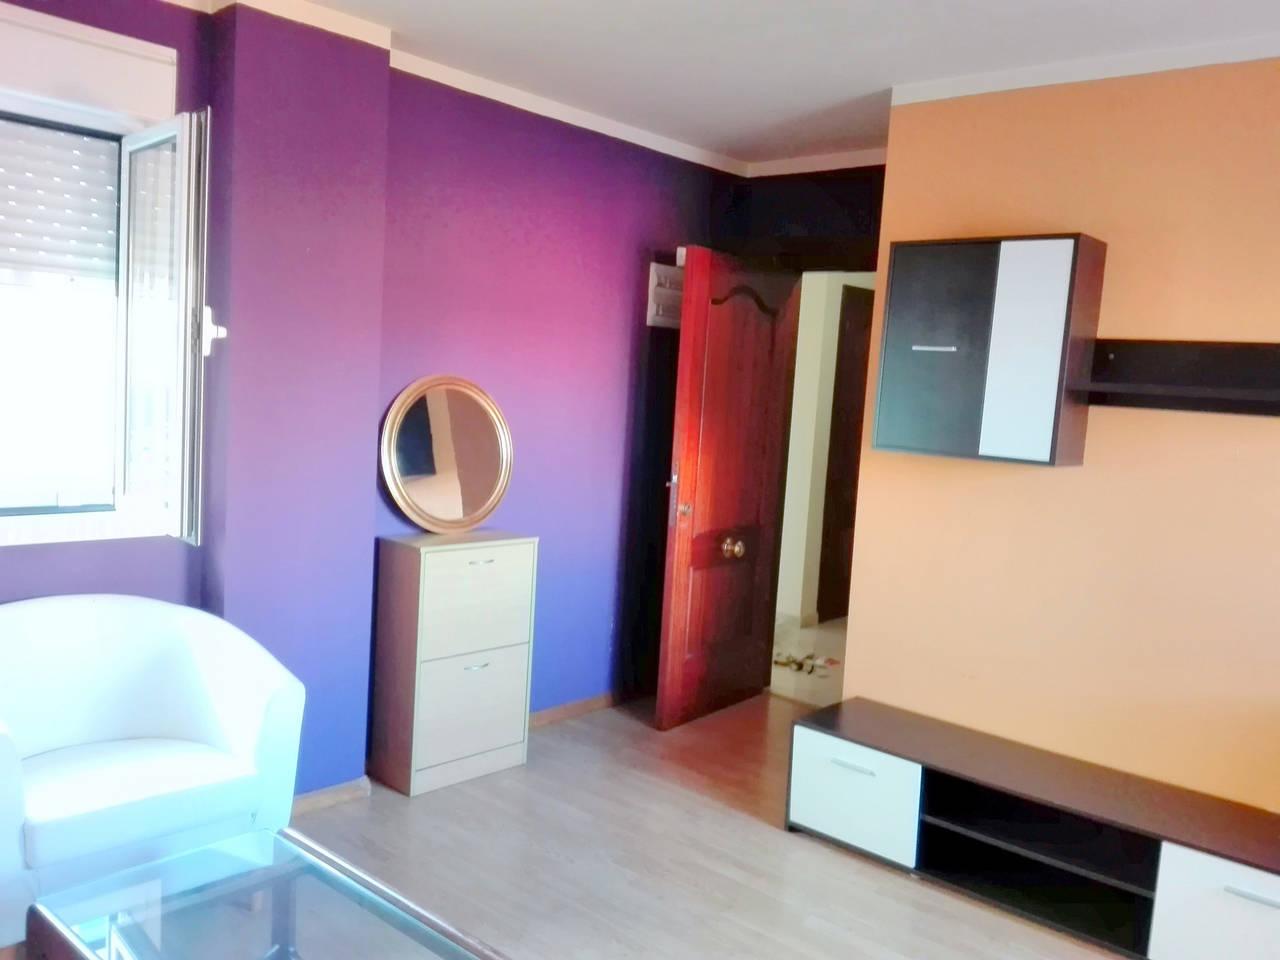 Se alquila  Vivienda con 1 dormitorio con todo incluidoVivienda  - Foto 21